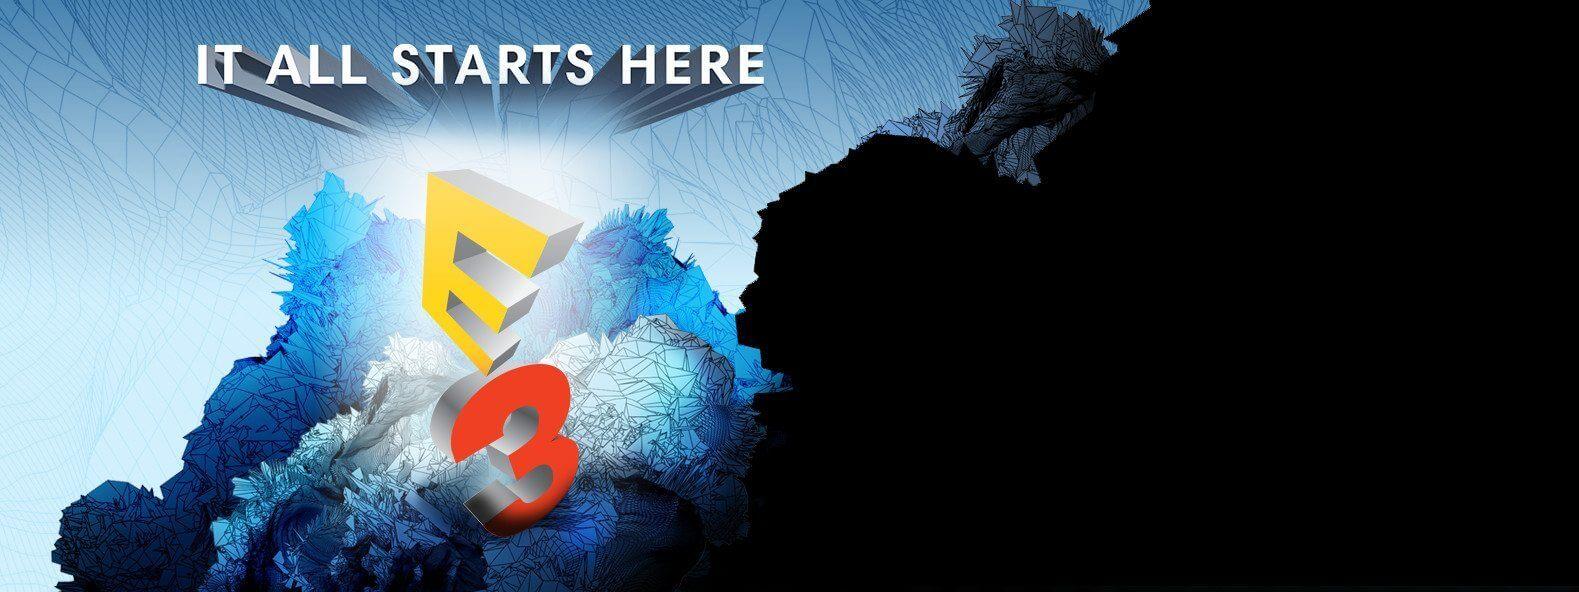 O que esperar da E3 2017? Ubisoft, EA, Activision e outras publicadoras